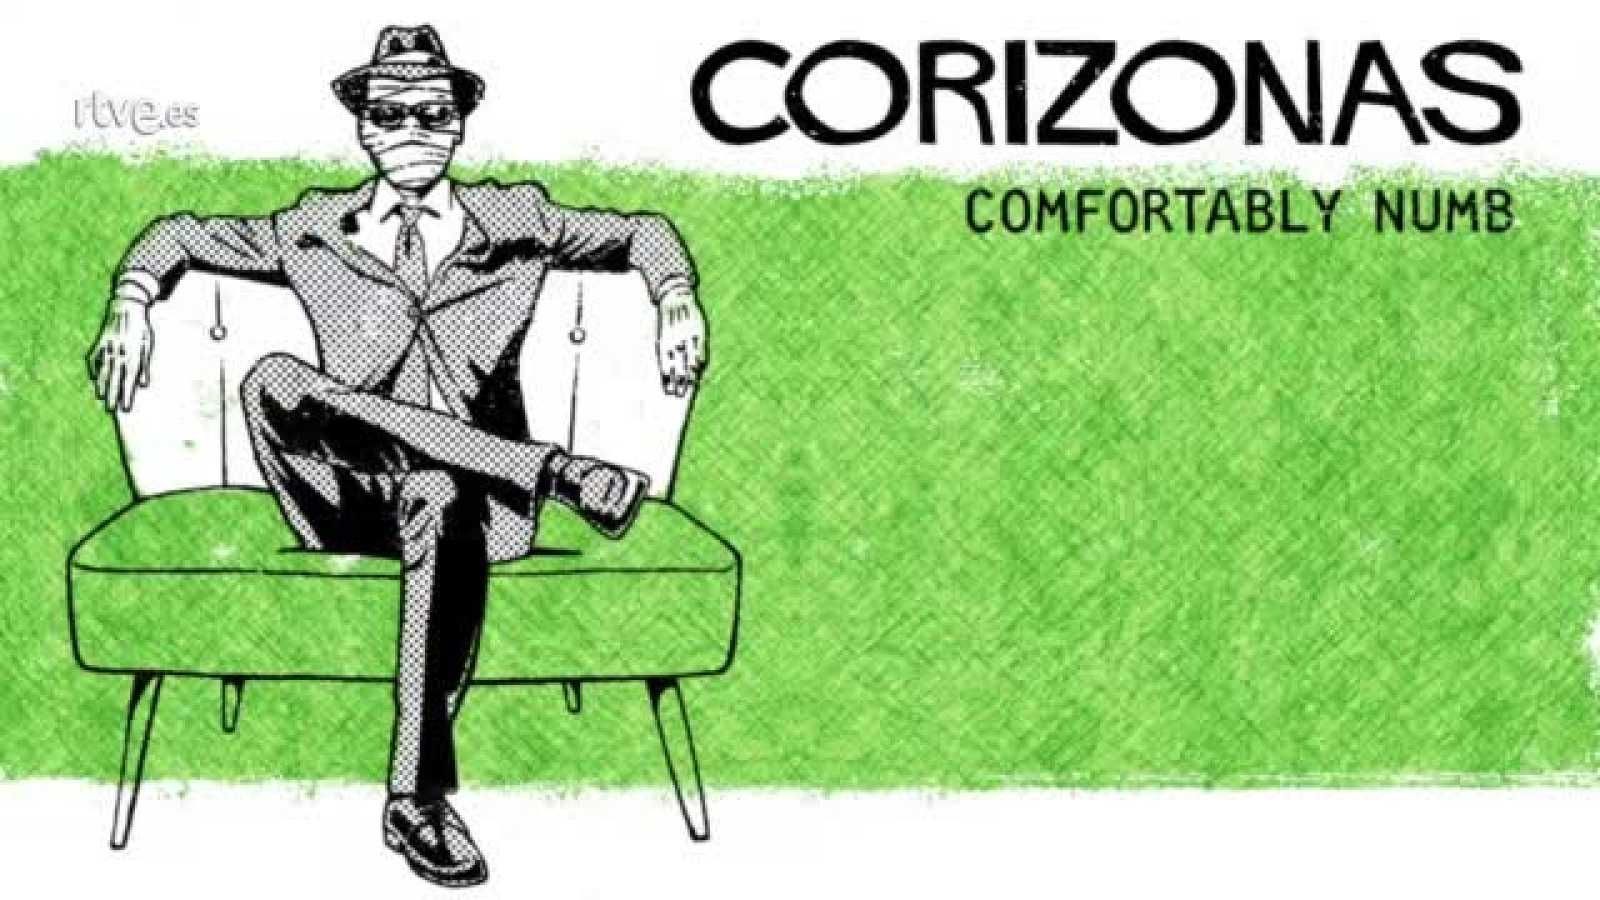 Corizonas - Comfortably Numb